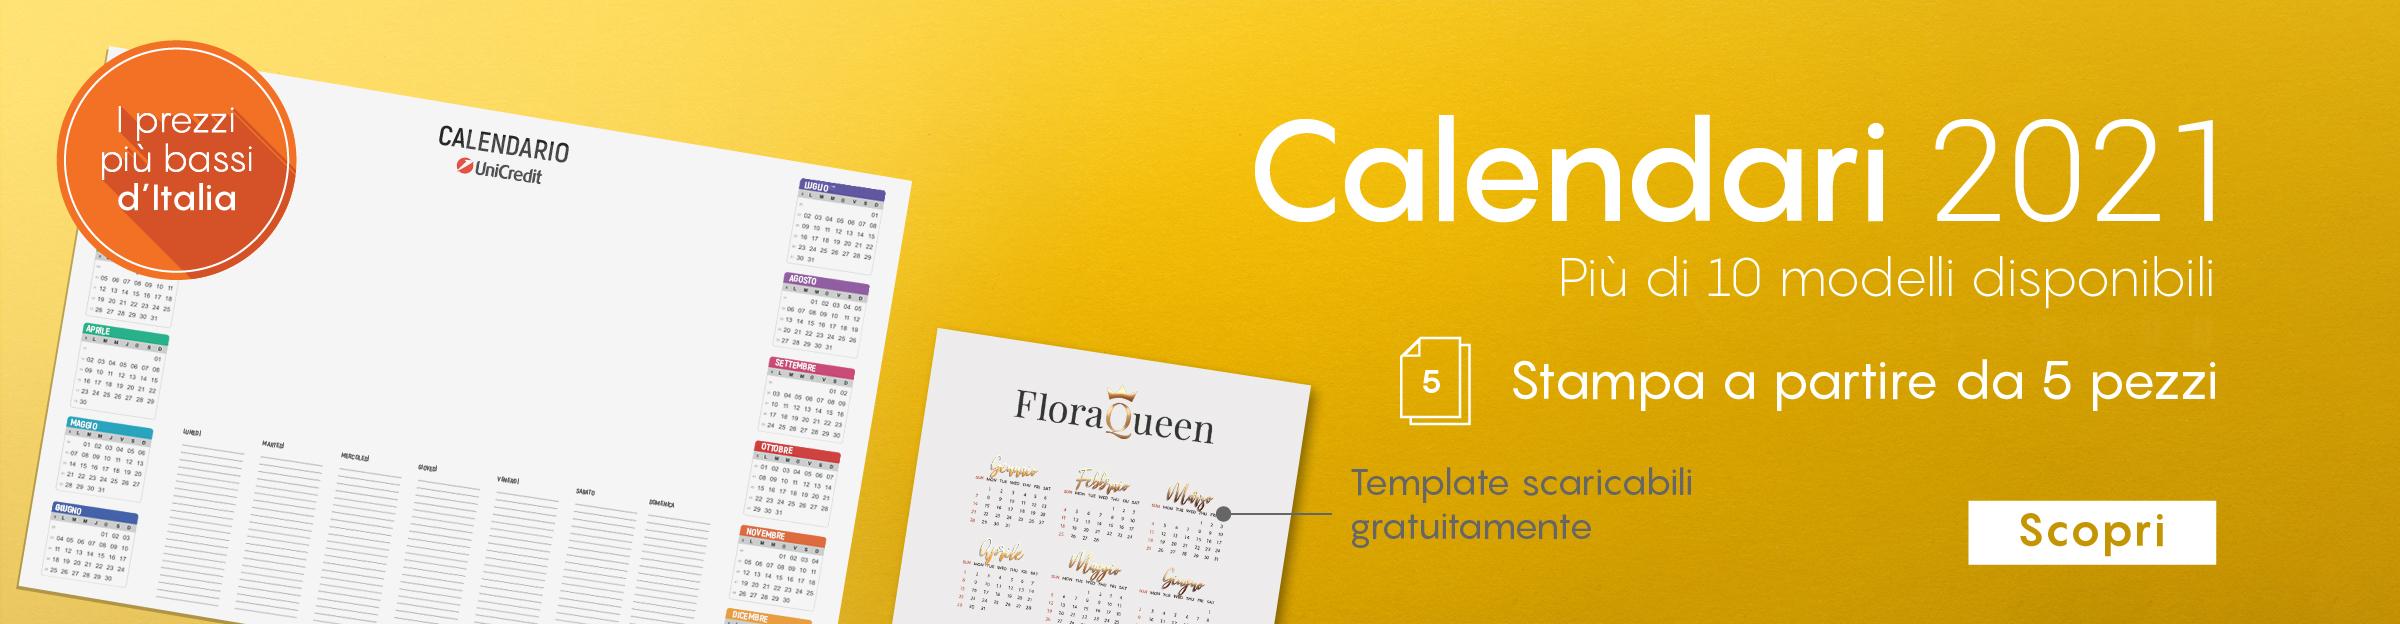 calendari2021